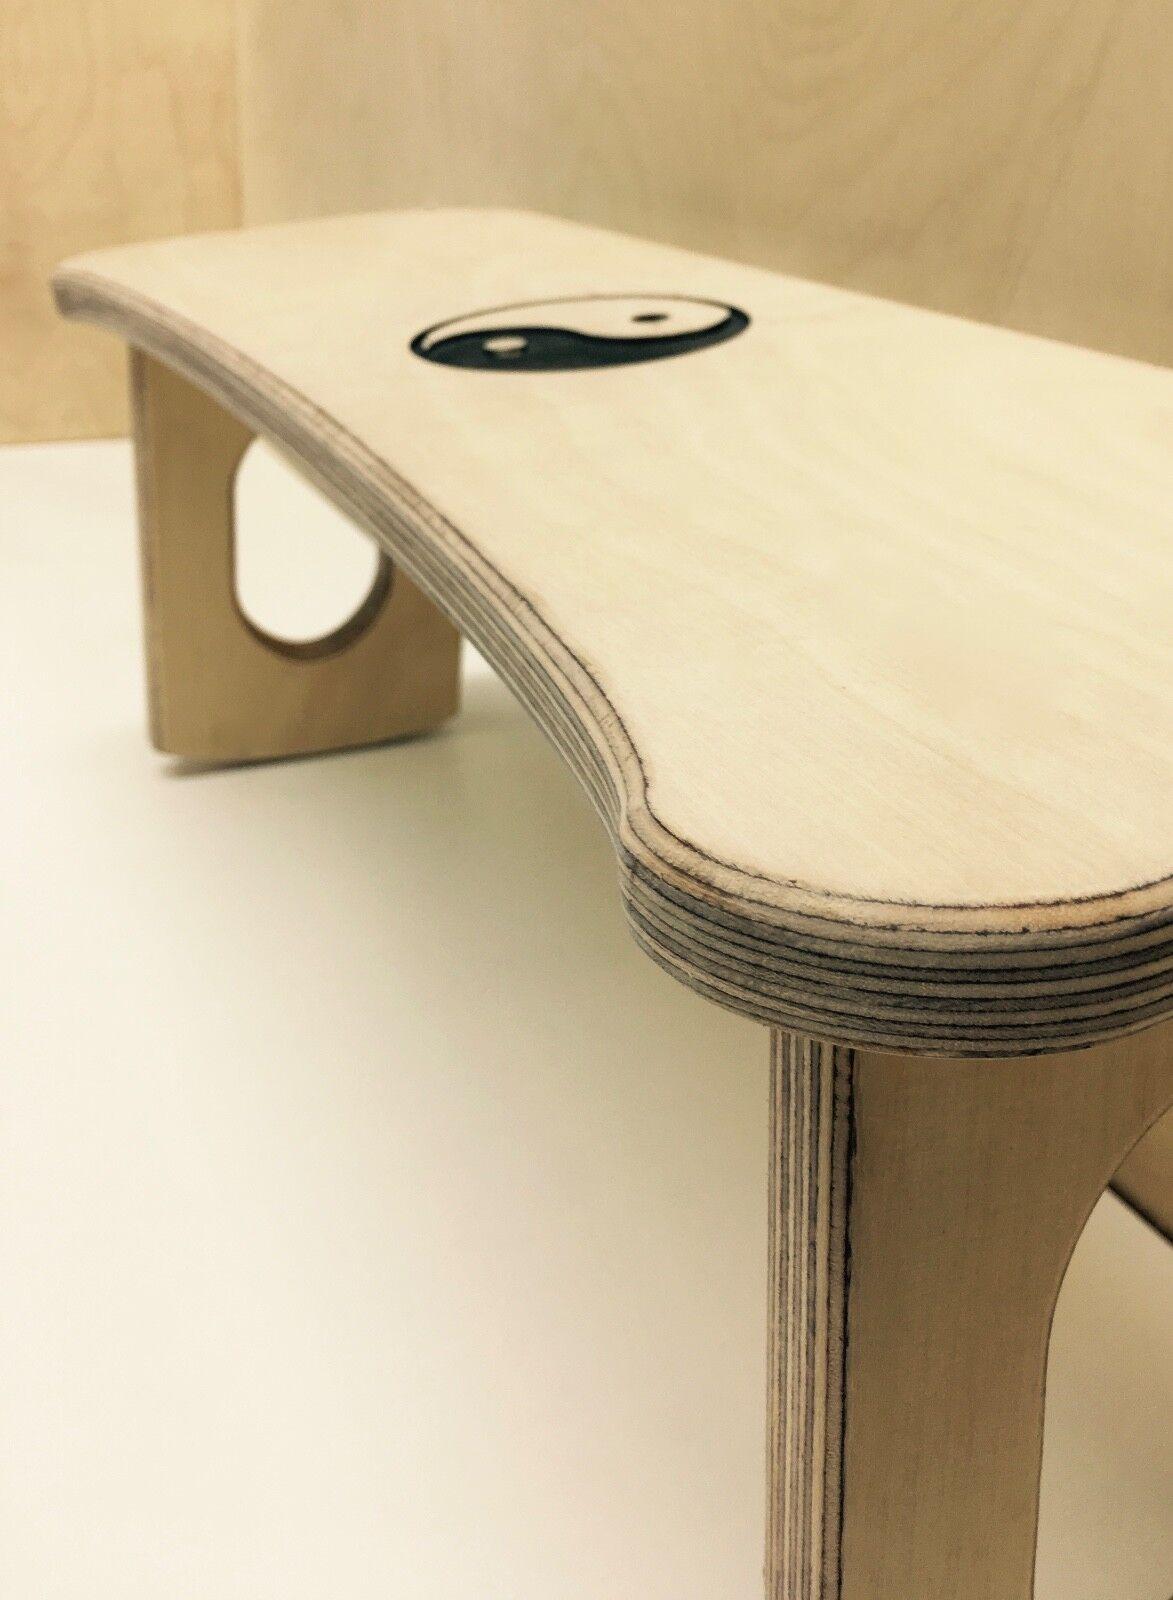 Meditation Stool - Birch ply construction, Folding, Very Portable, Hand Finished